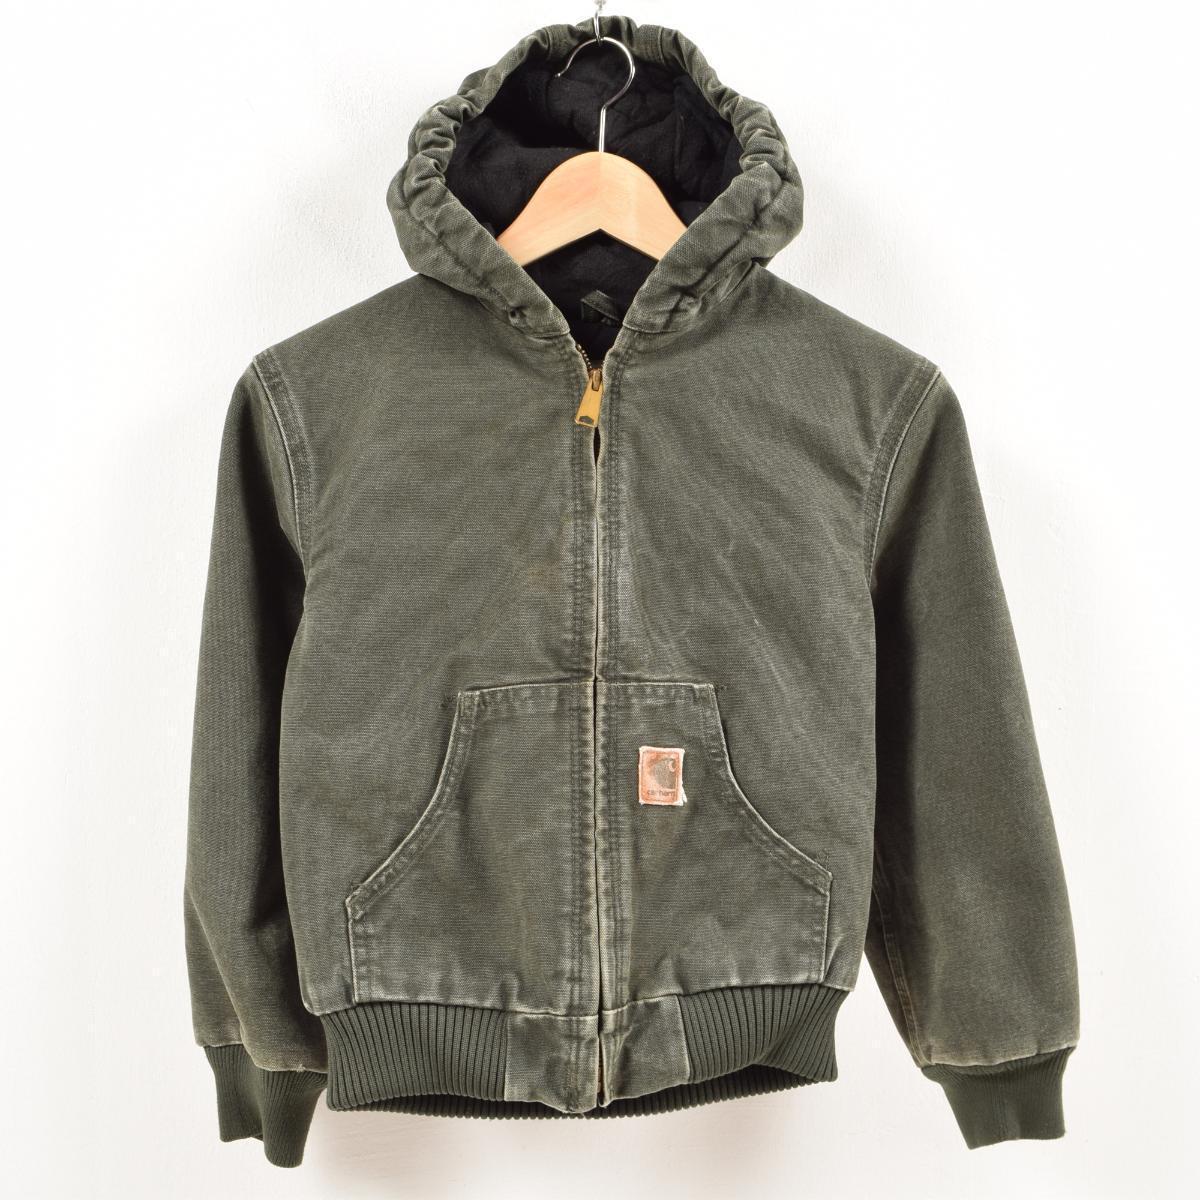 7487b092ab837 Car heart Carhartt active jacket duck place full zip parka boy 130cm  /wal1380 ...